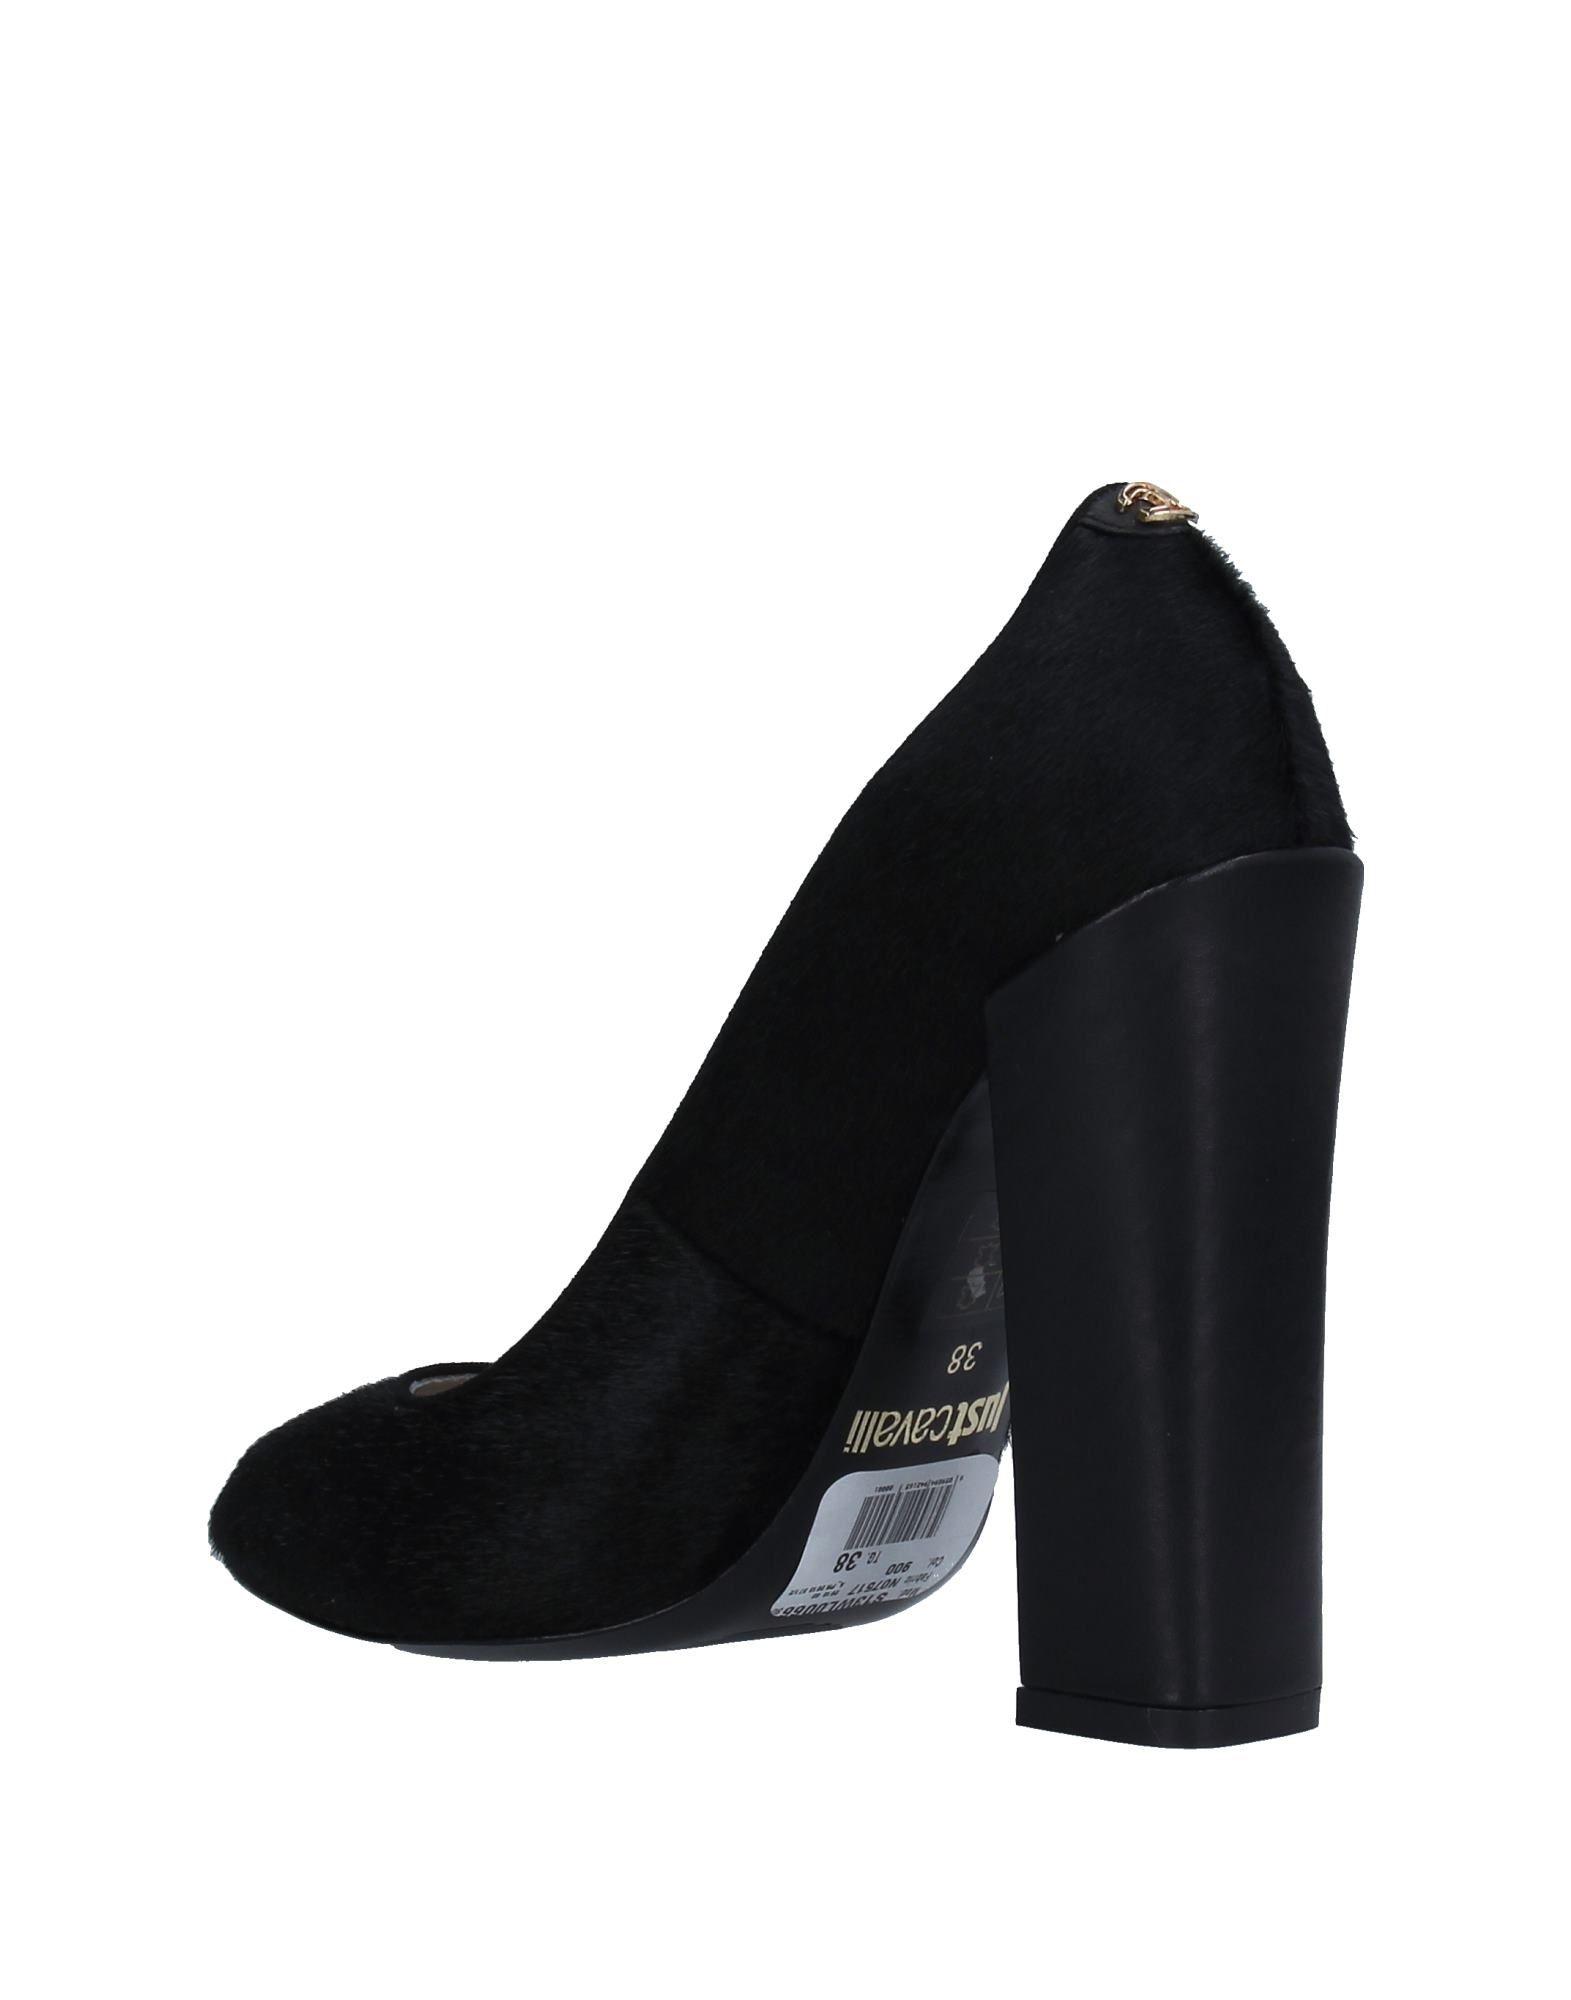 Stilvolle billige Schuhe Just Cavalli 11258613AA Pumps Damen  11258613AA Cavalli 3ba080